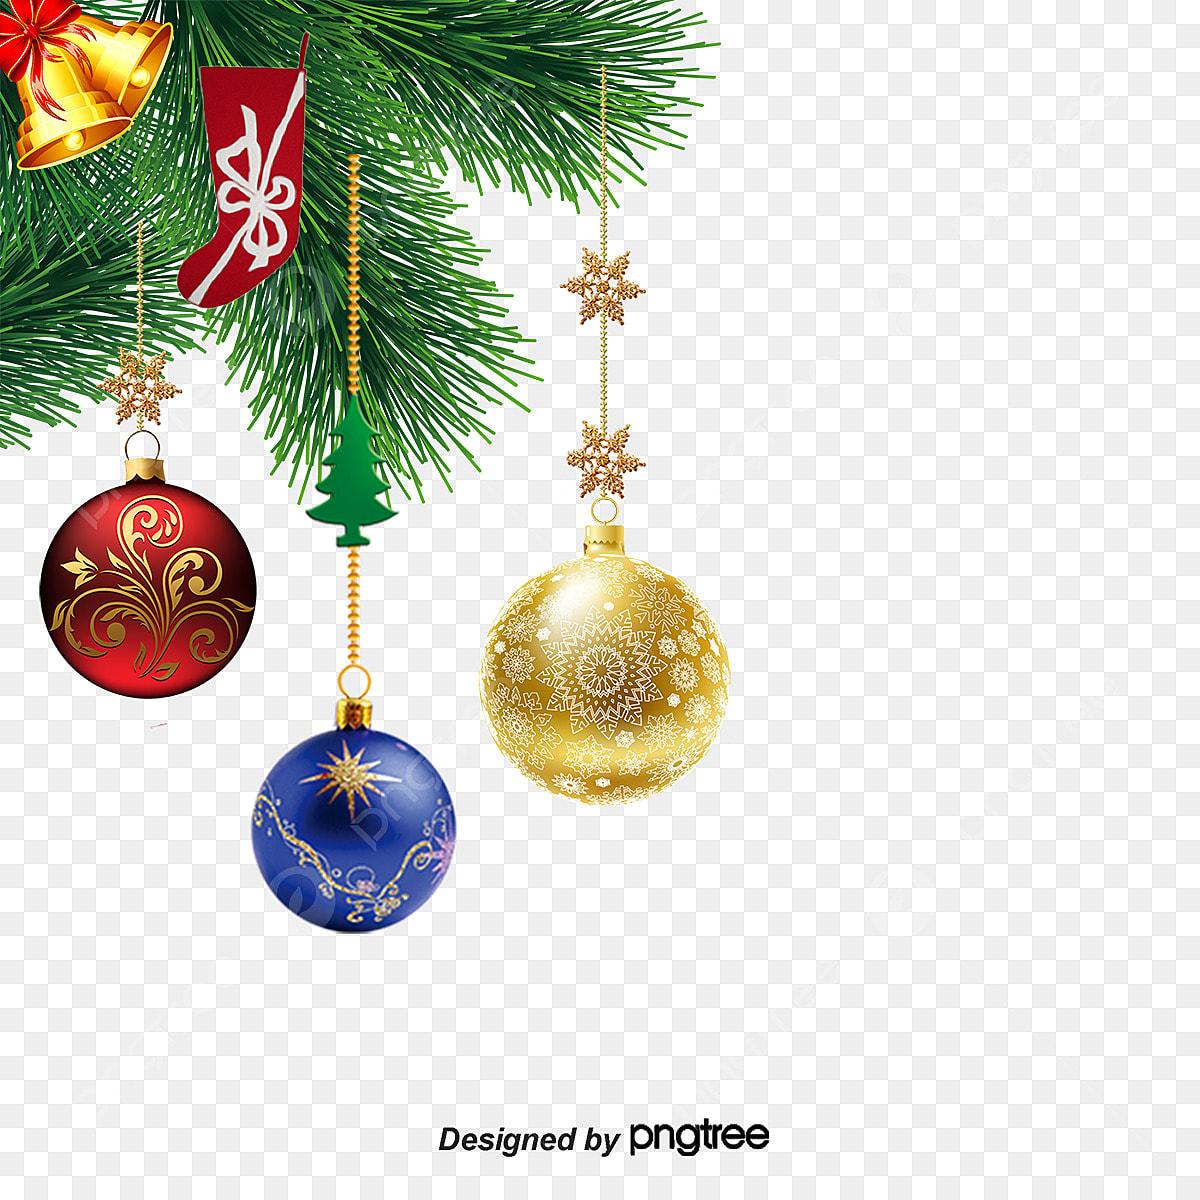 Christmas Ornament Vector.Christmas Ornaments Png Vector Material Christmas Vector